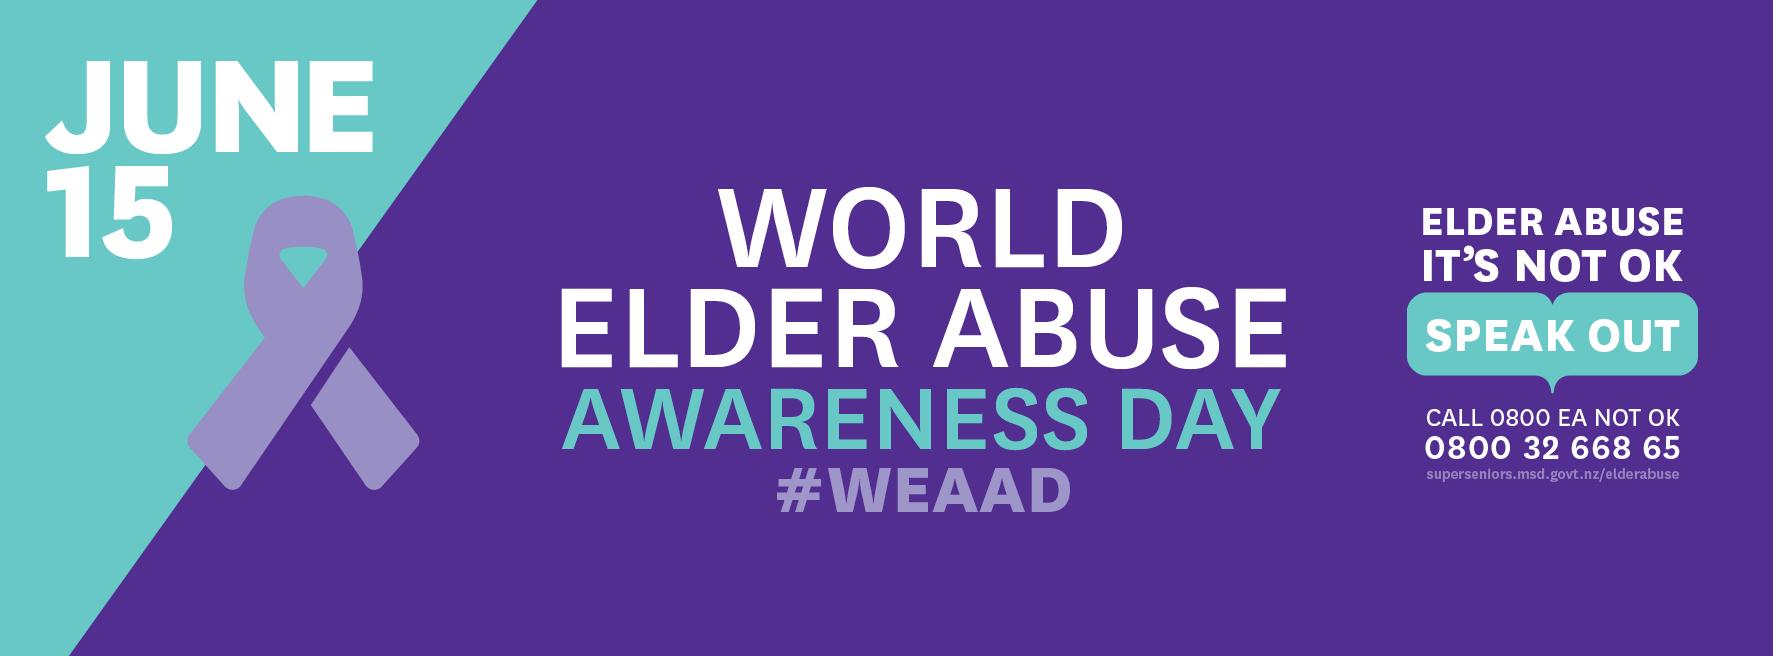 Elder_Abuse-WEAAD2018_Social_Media header_150dpi_851x315.png